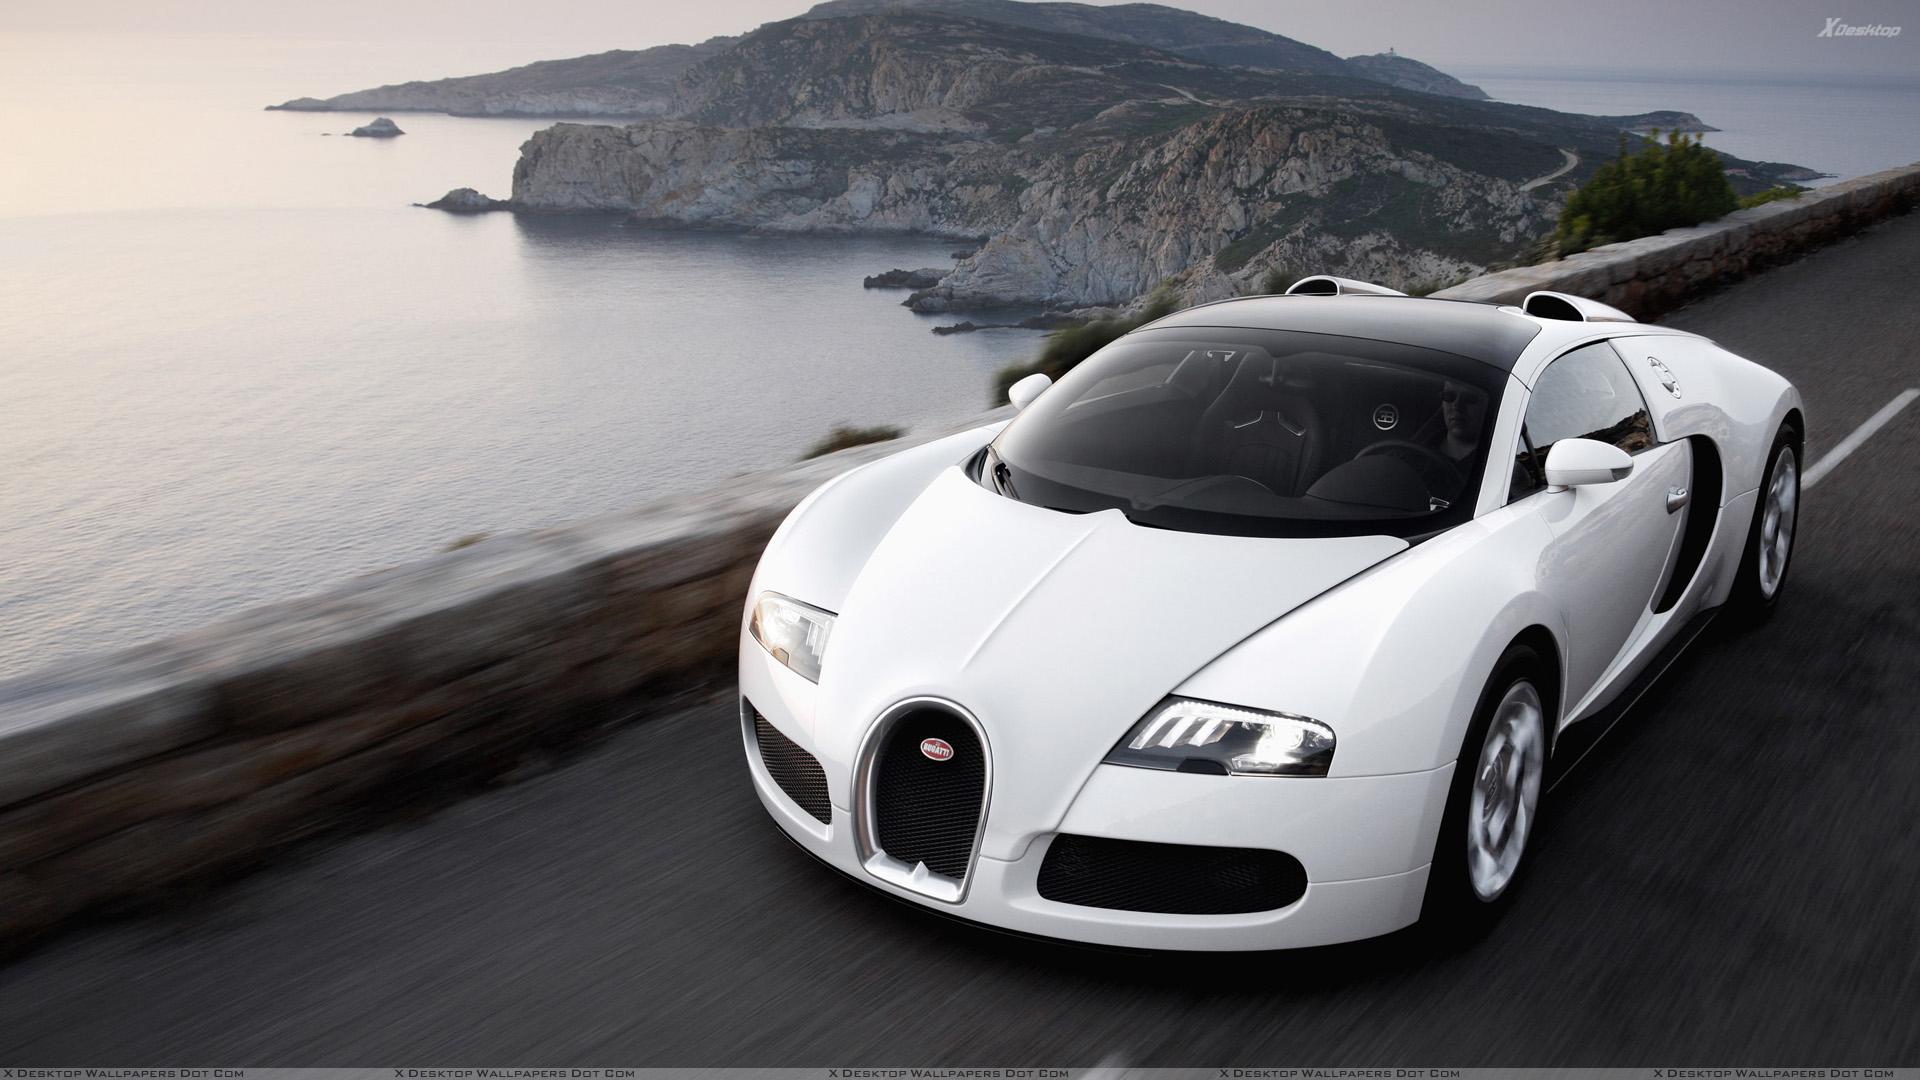 White Bugatti Veyron Wallpaper 01